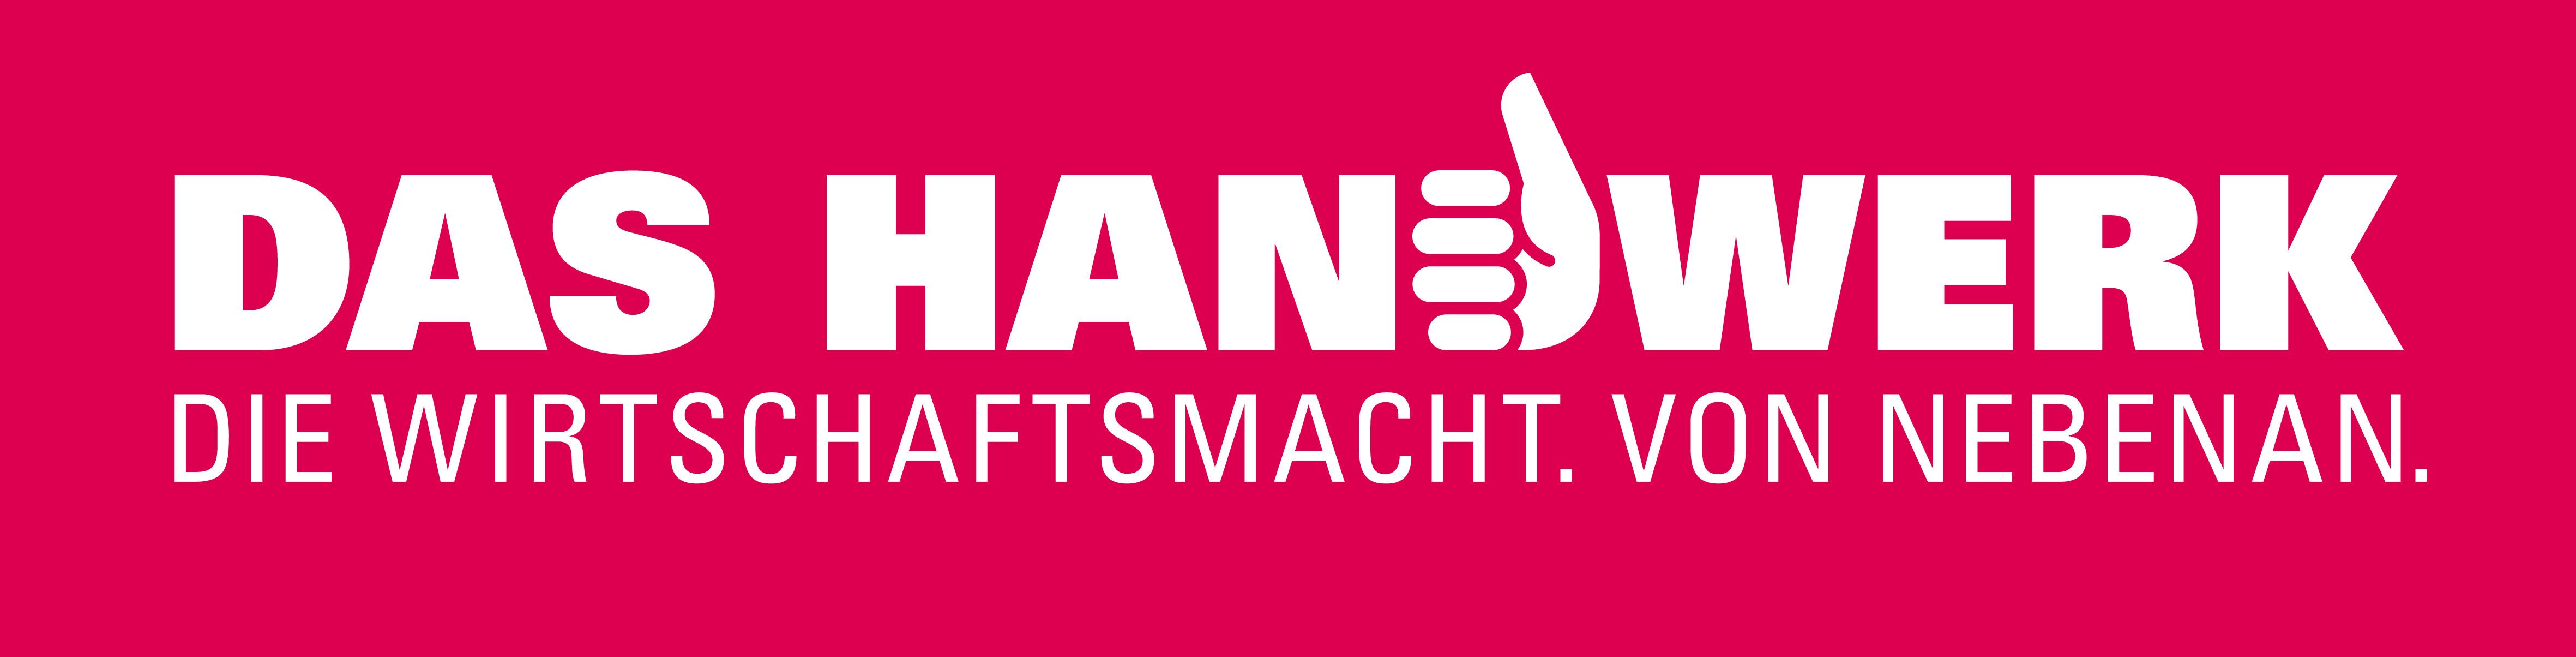 Banner_845x1264cm_Logo